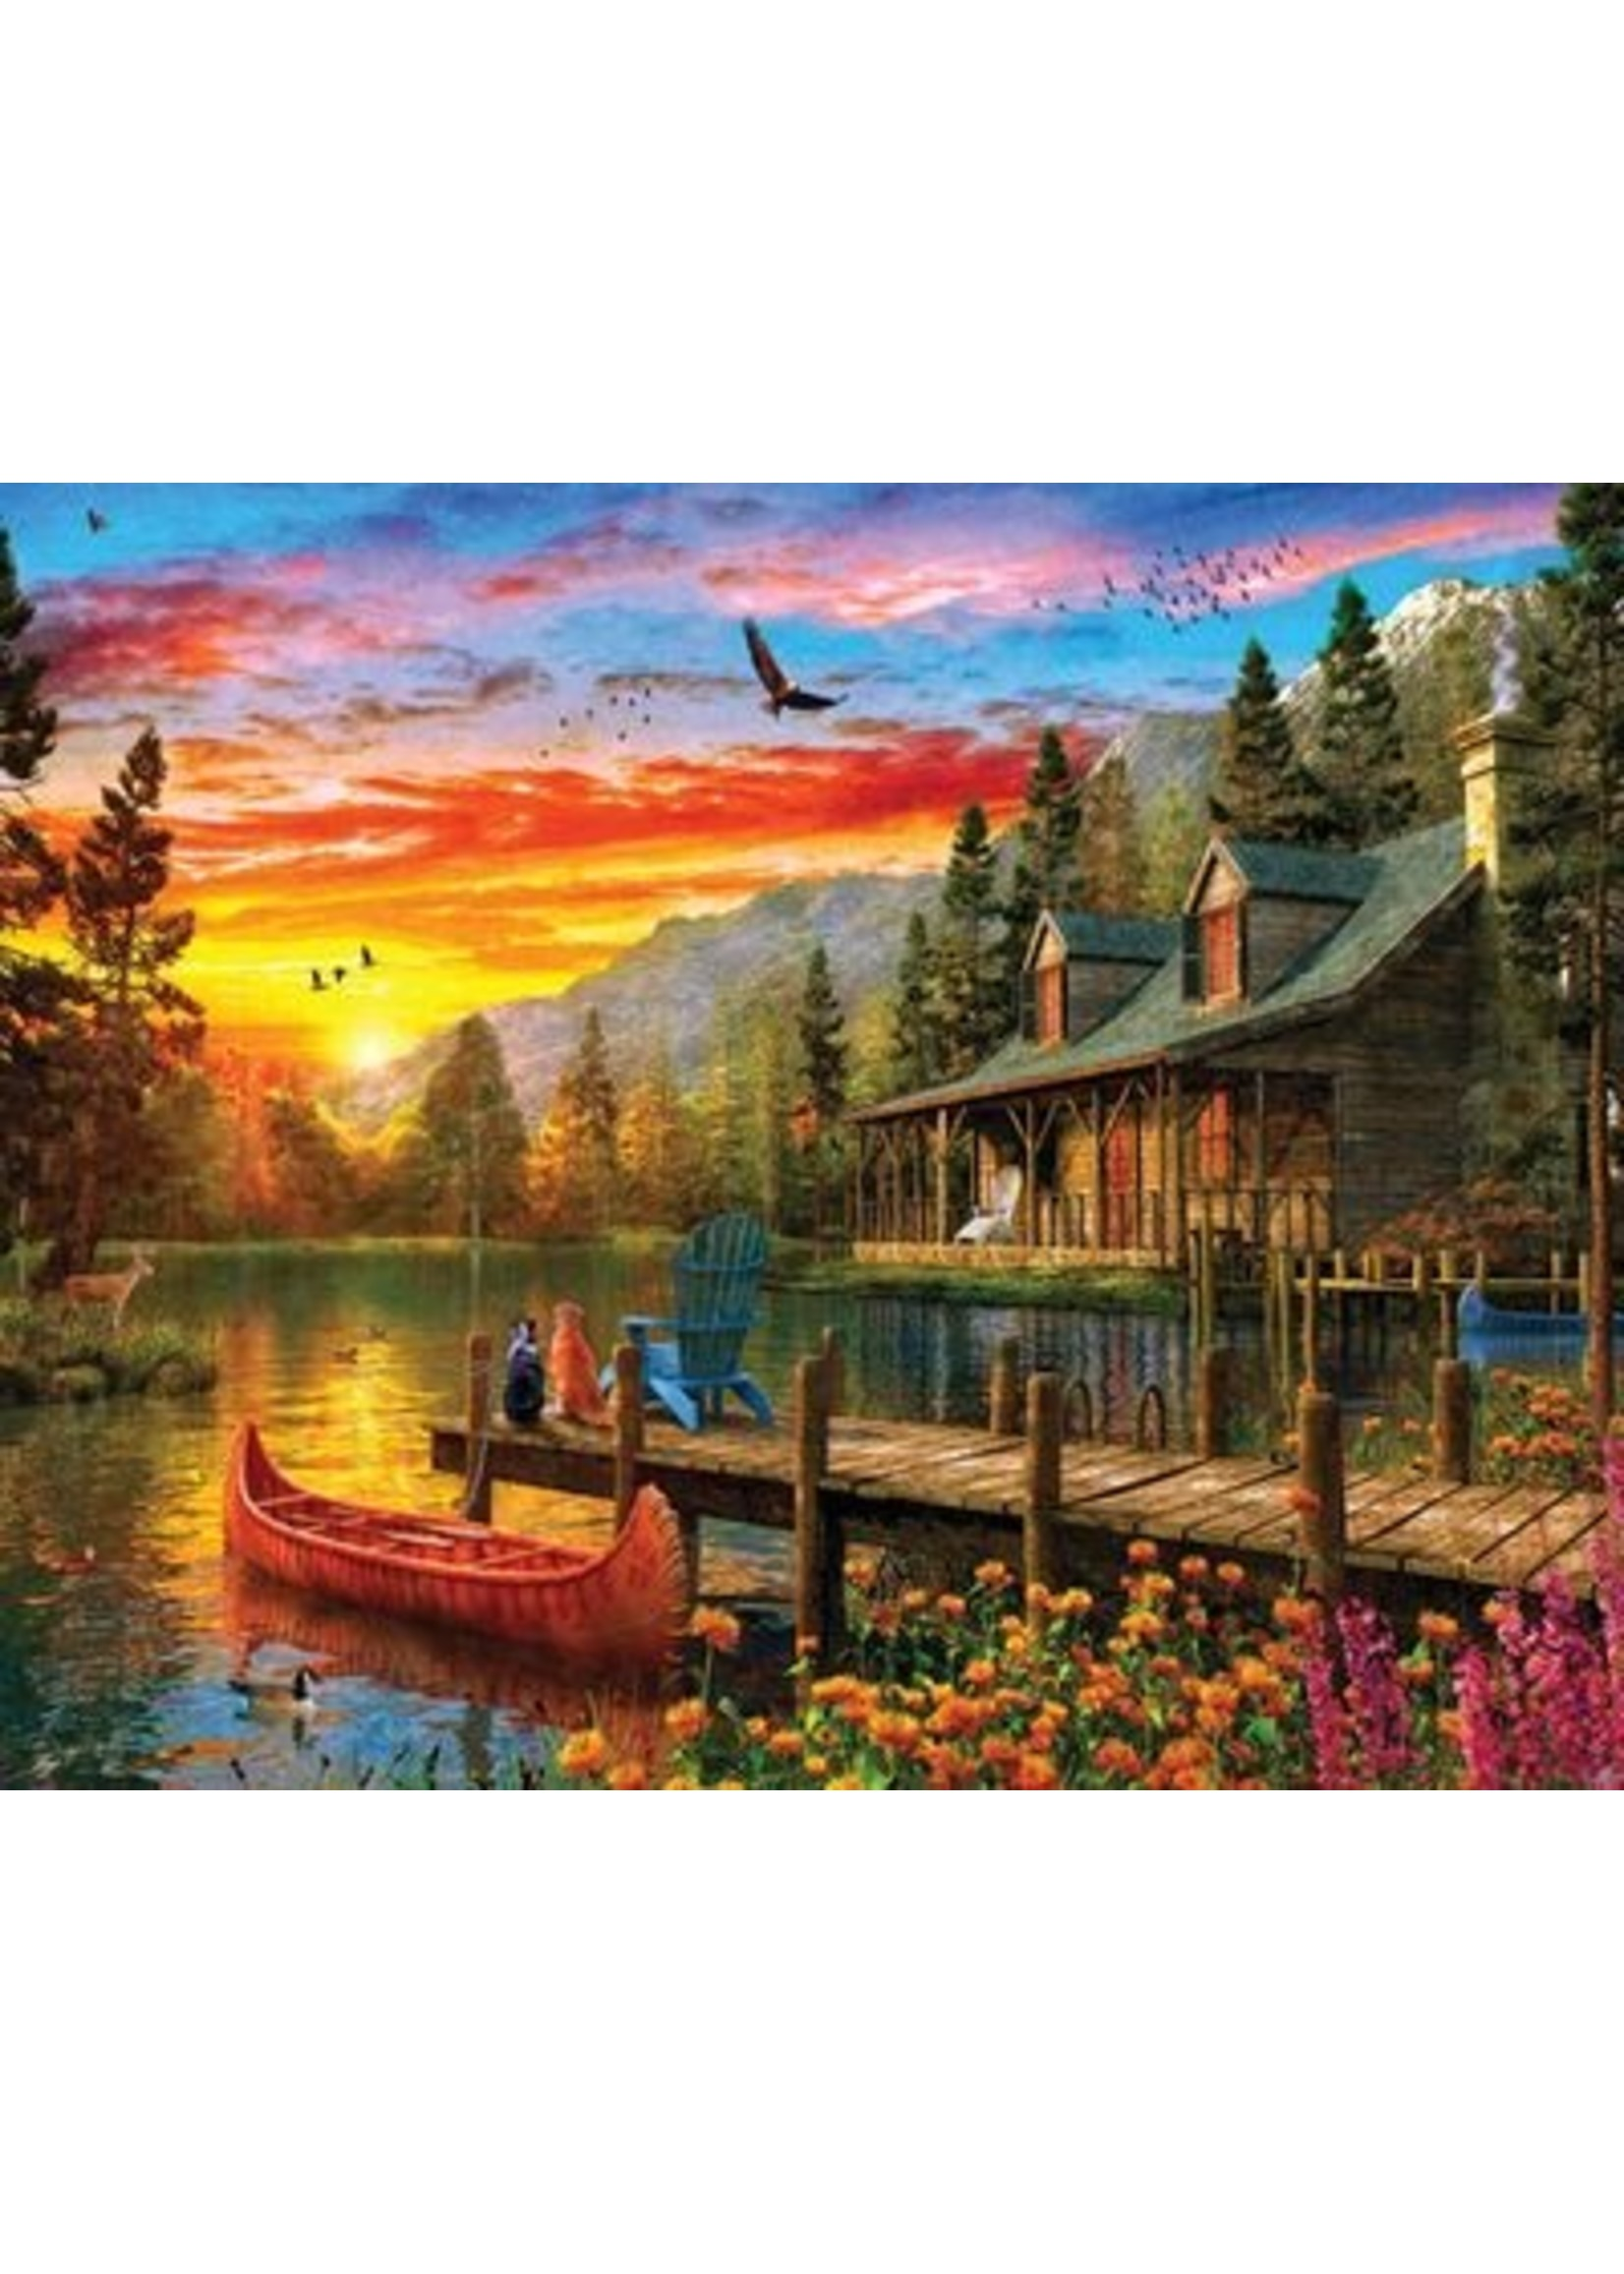 Cabin Evening Sunset